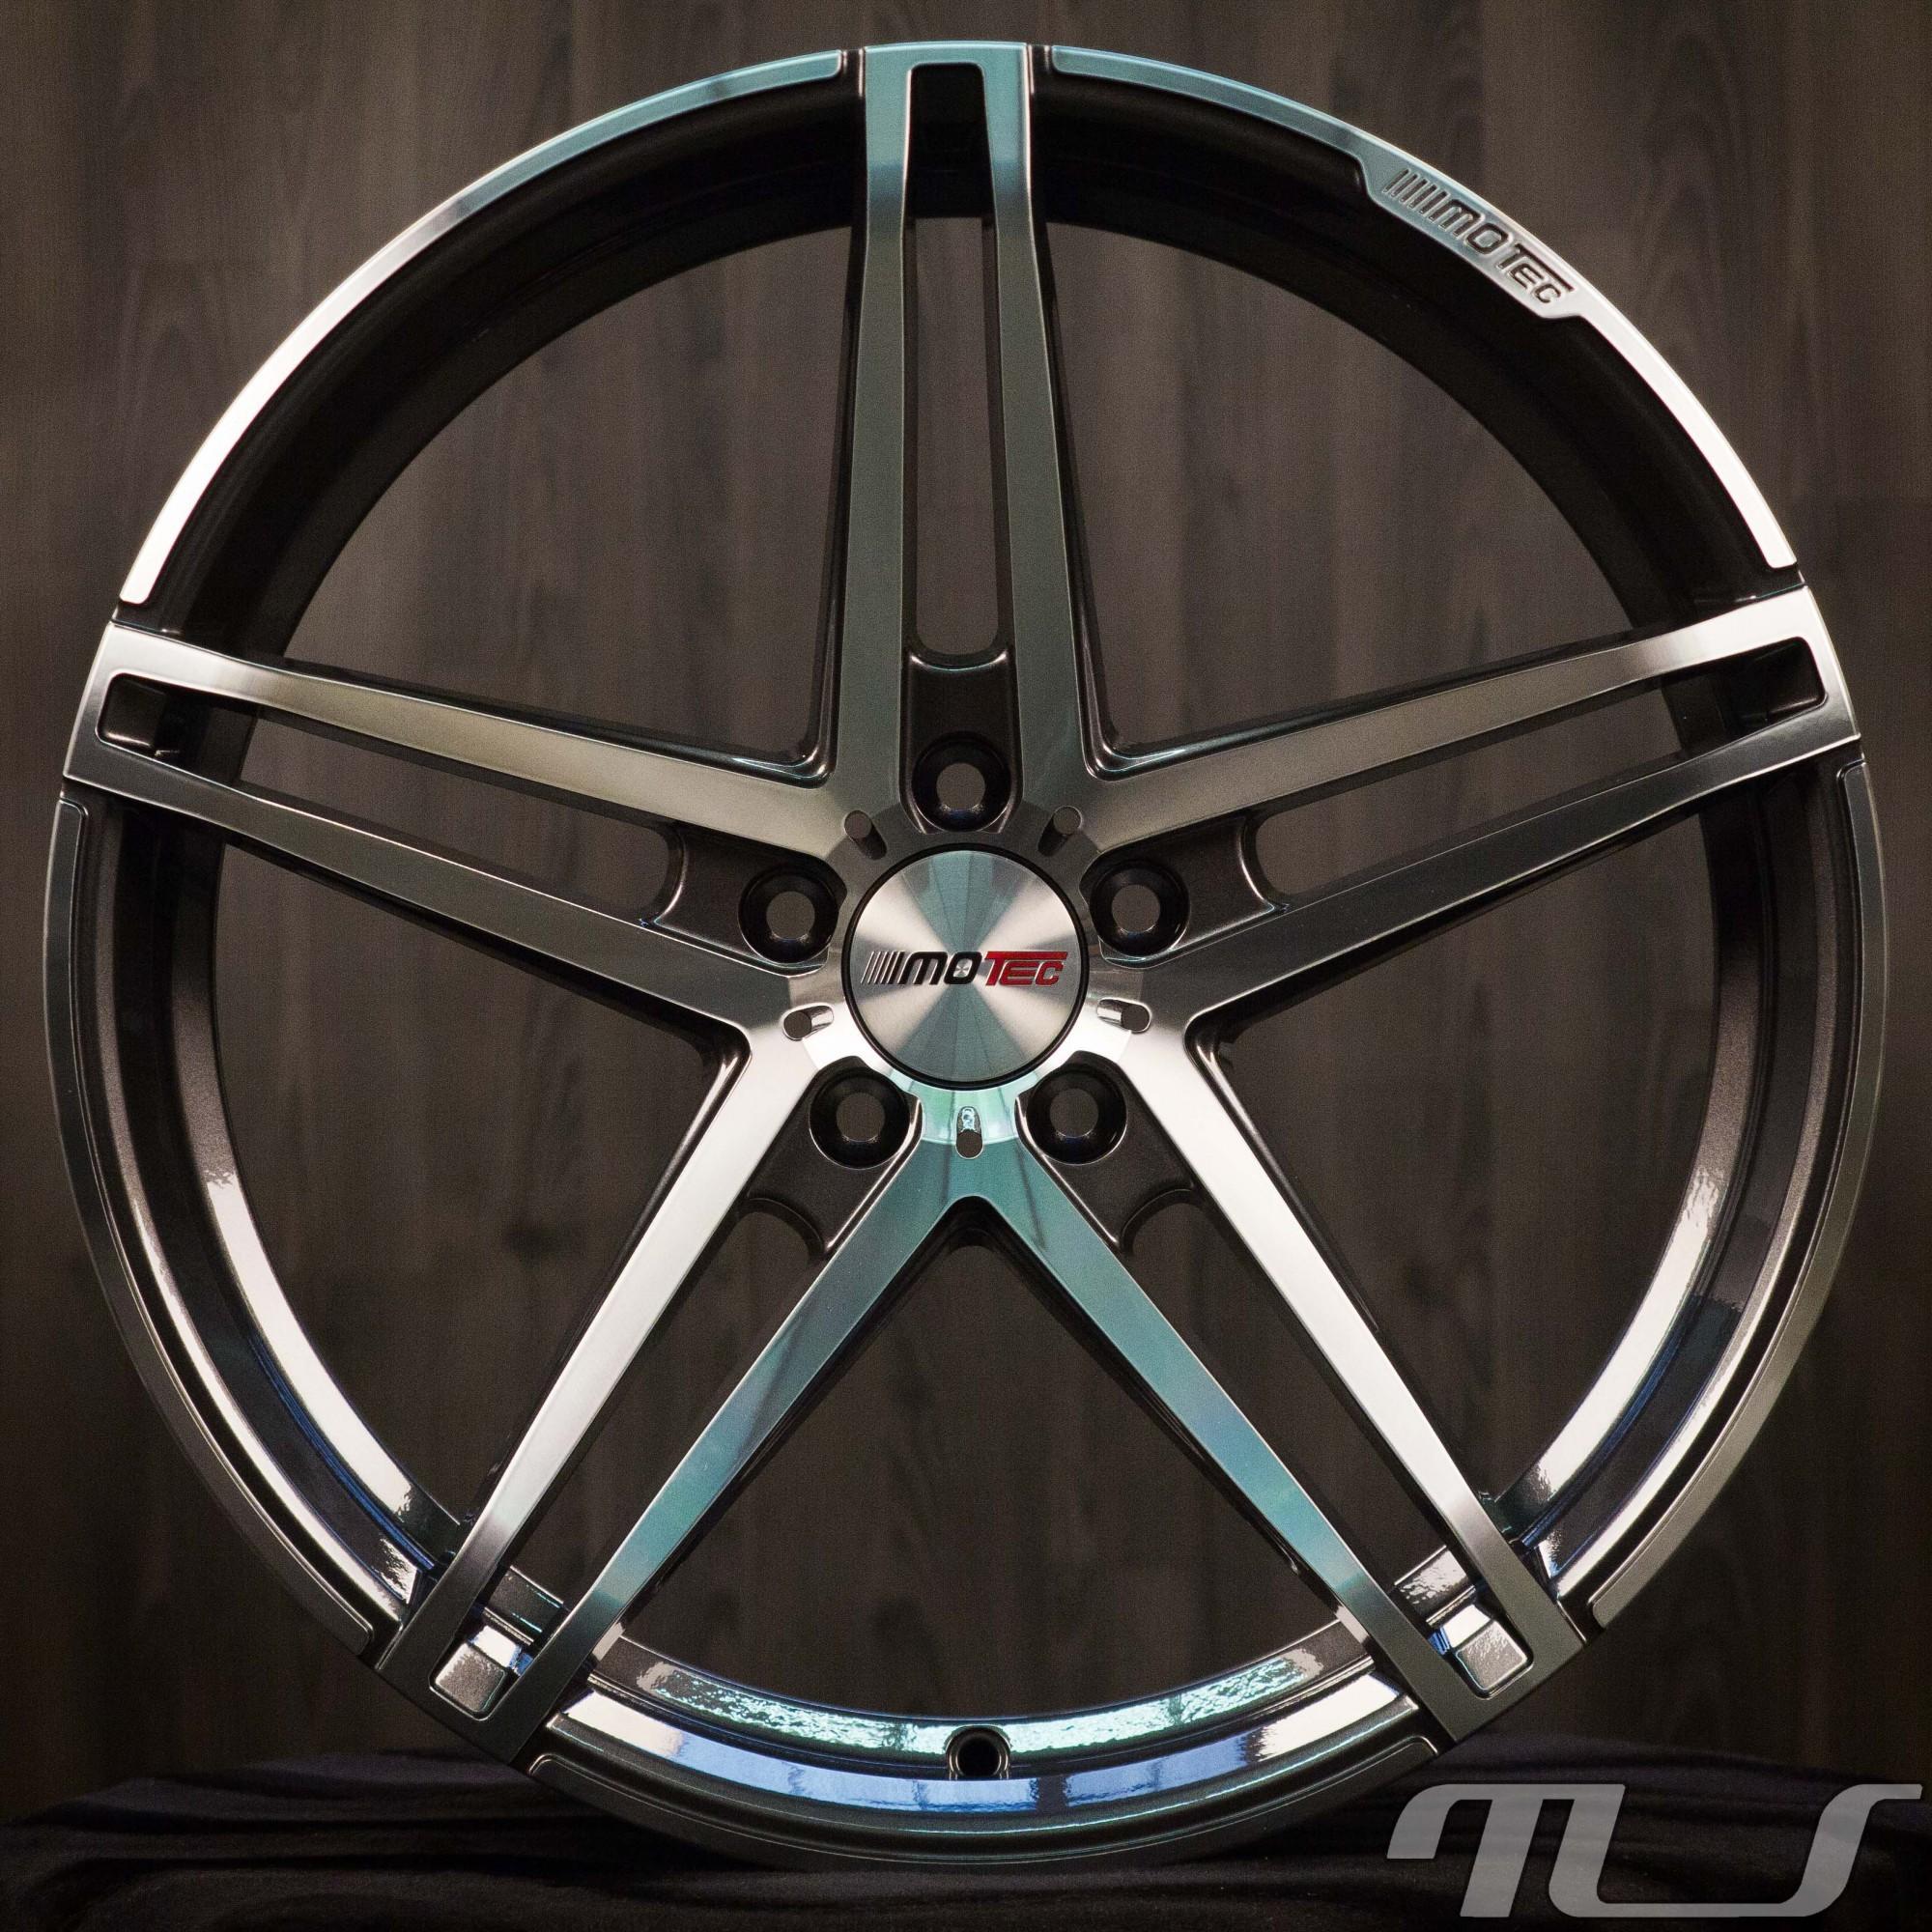 19 Inch Alloy Wheels For Mercedes Benz A B C E Cls Class